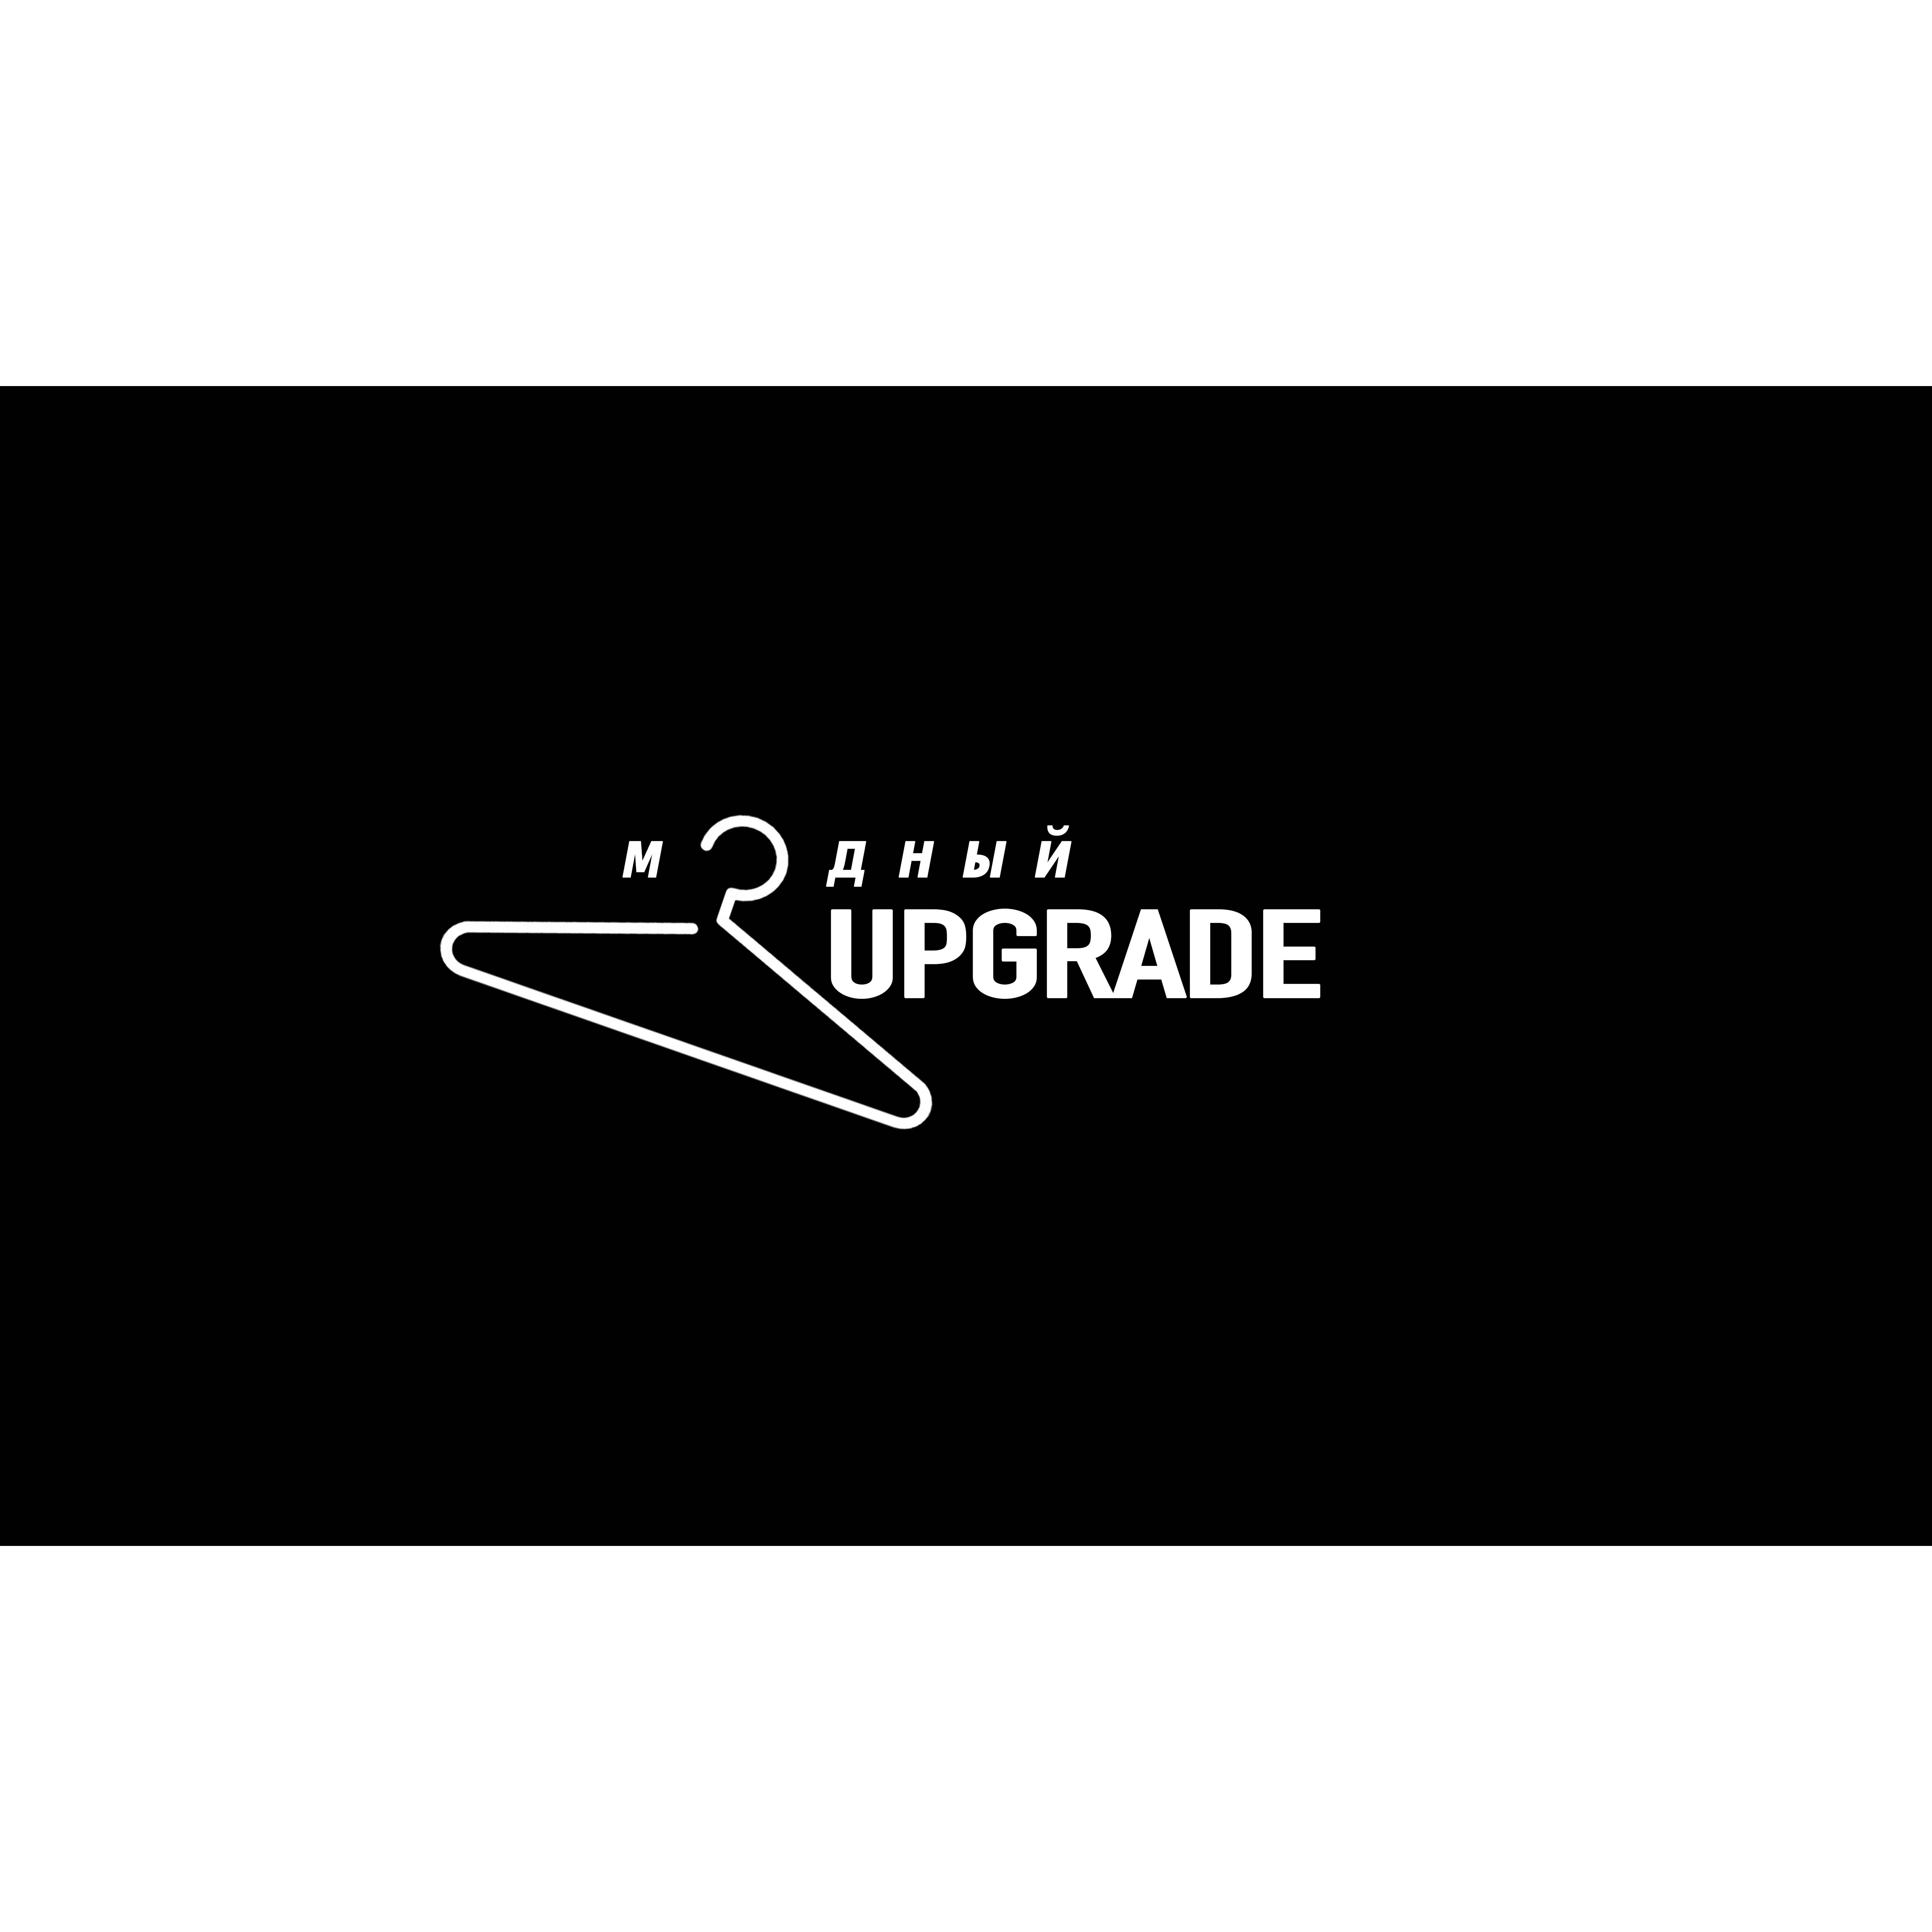 "Логотип интернет магазина ""Модный UPGRADE"" фото f_1815949361d404ea.jpg"